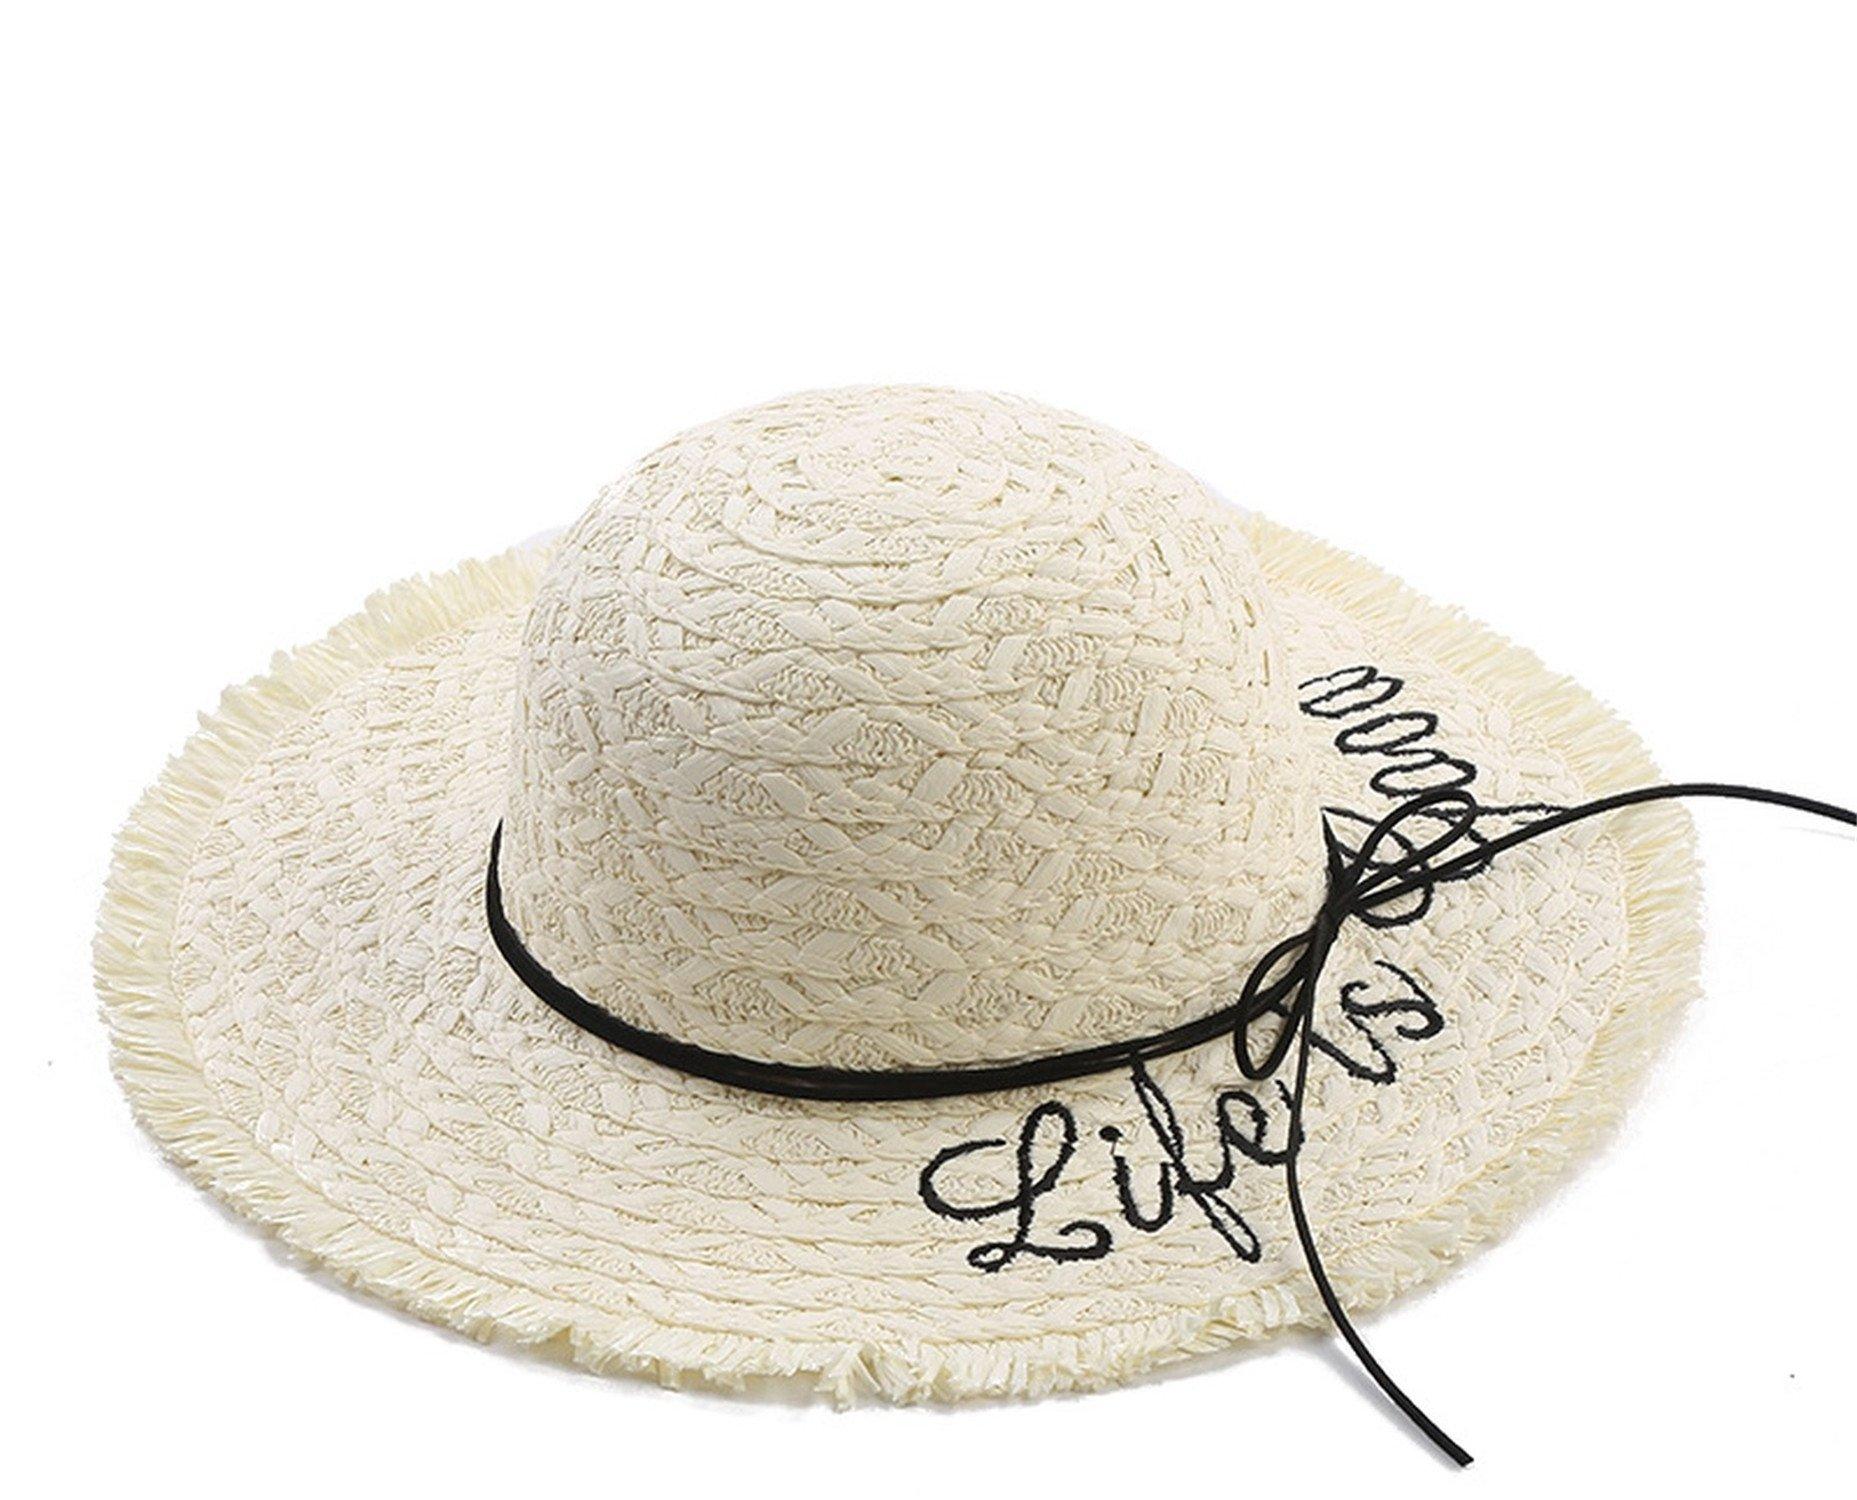 Sllxgli spring and summer travel straw hat fashion straw hat sun hat